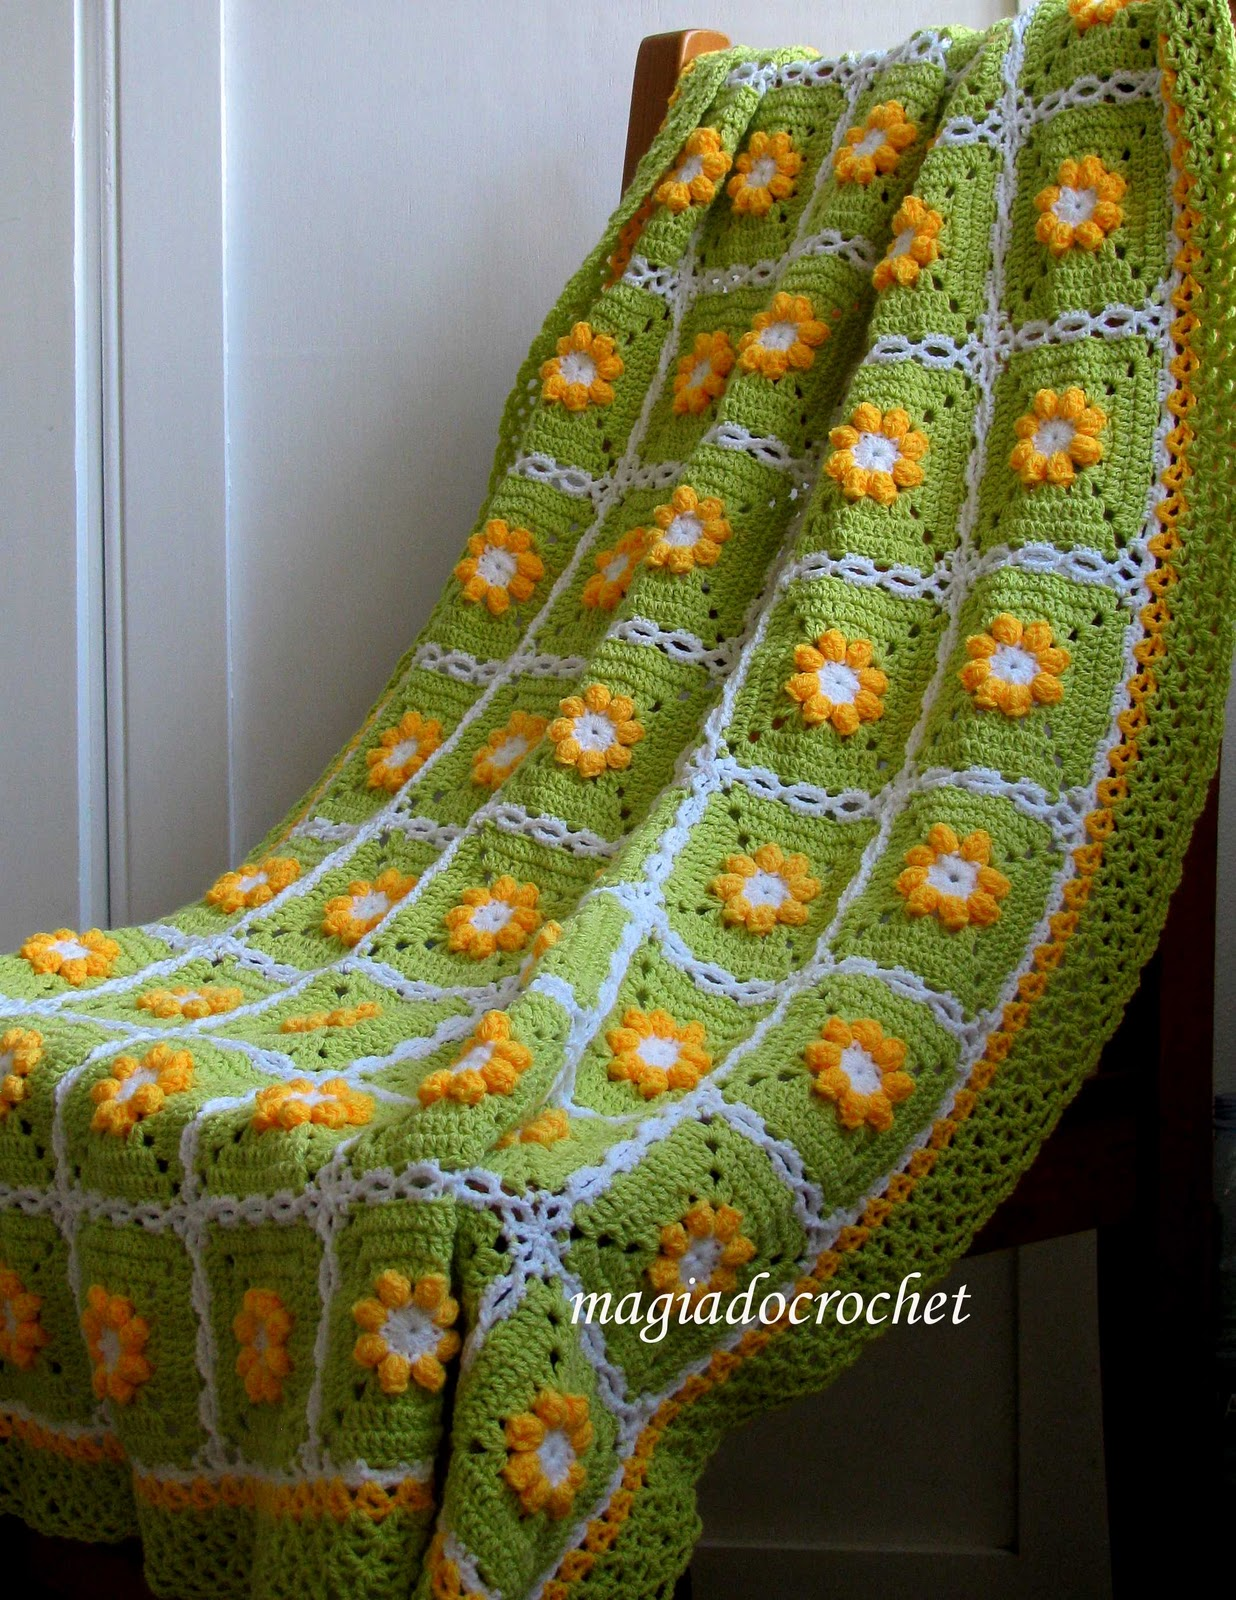 http://2.bp.blogspot.com/_w0wlWLYQlgw/TOMBnkhZOfI/AAAAAAAAHNs/aihoKiGMgSU/s1600/nova+colcha+verde.jpg